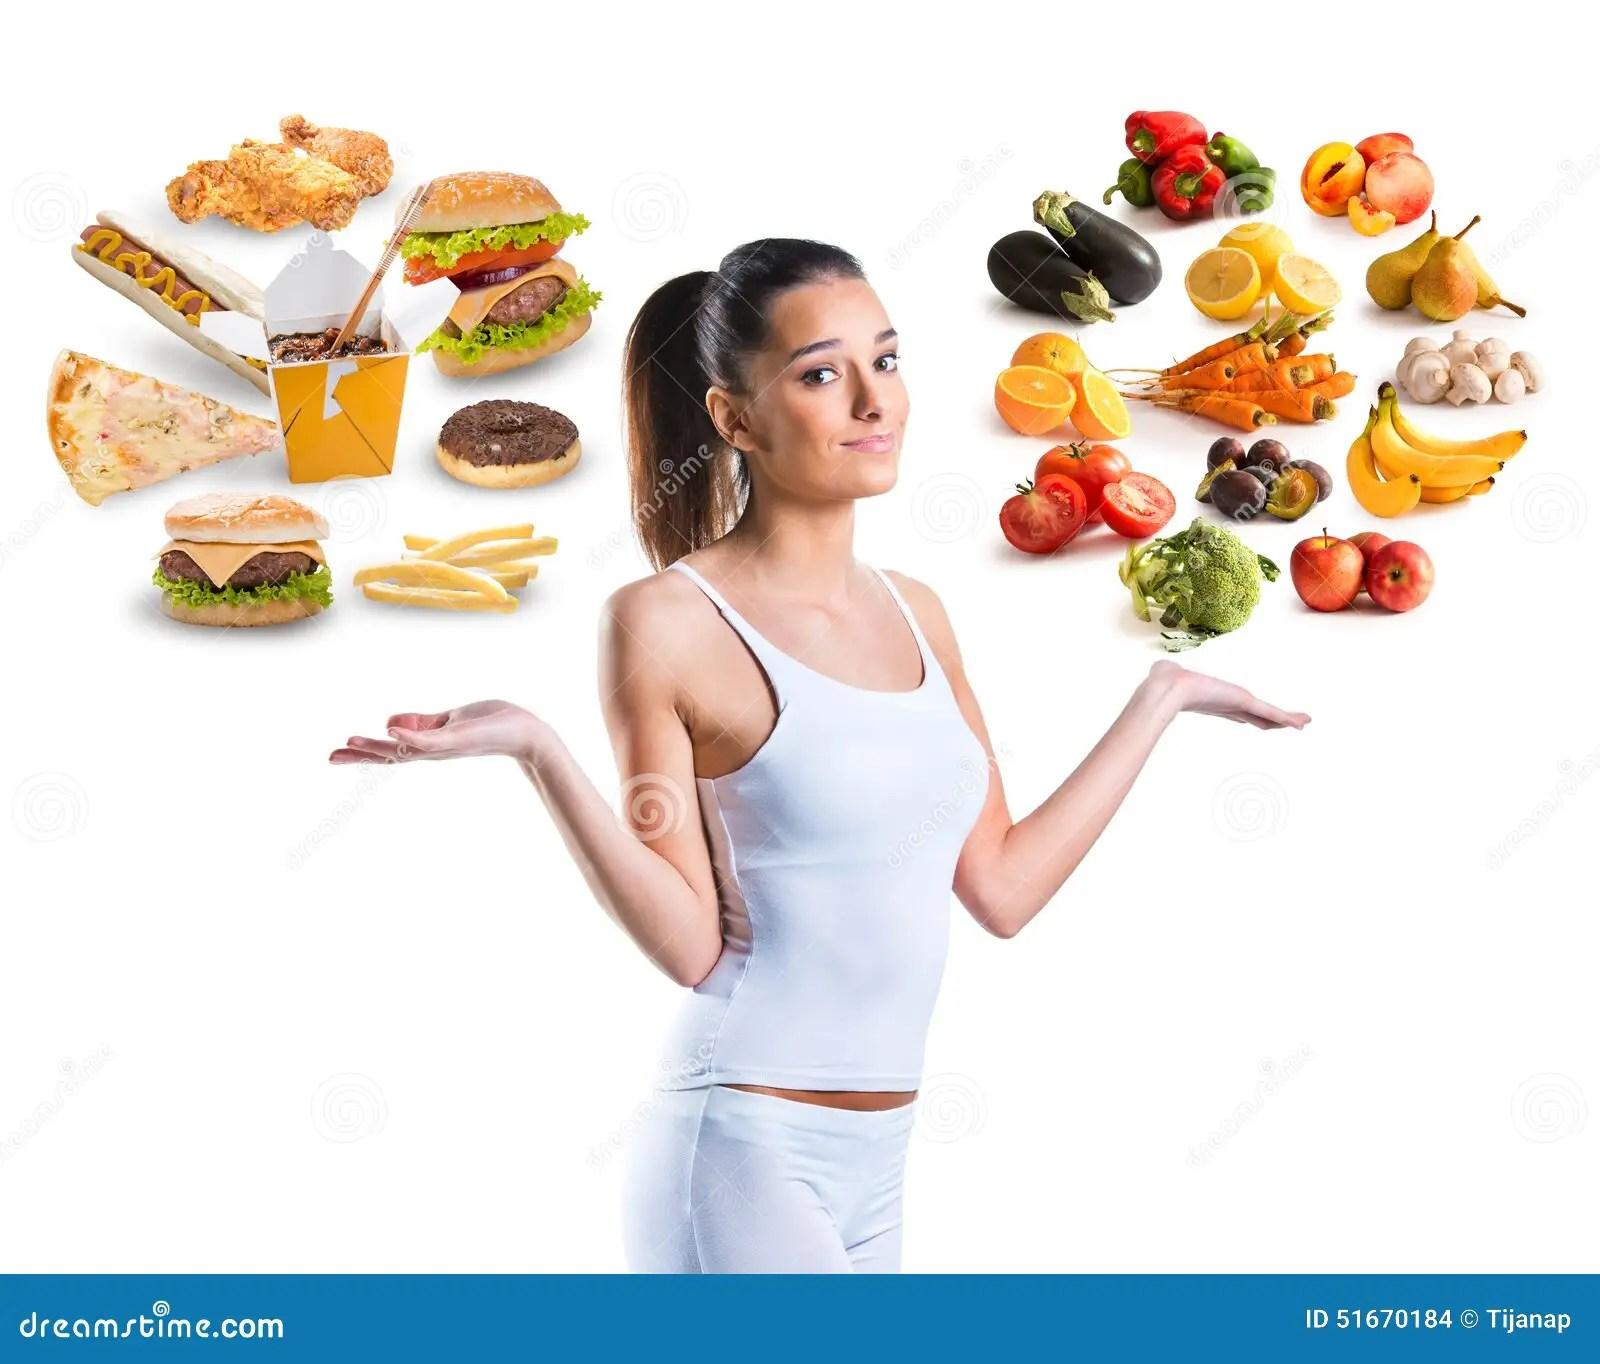 Unhealthy Vs Healthy Food Stock Photo Image Of Beauty